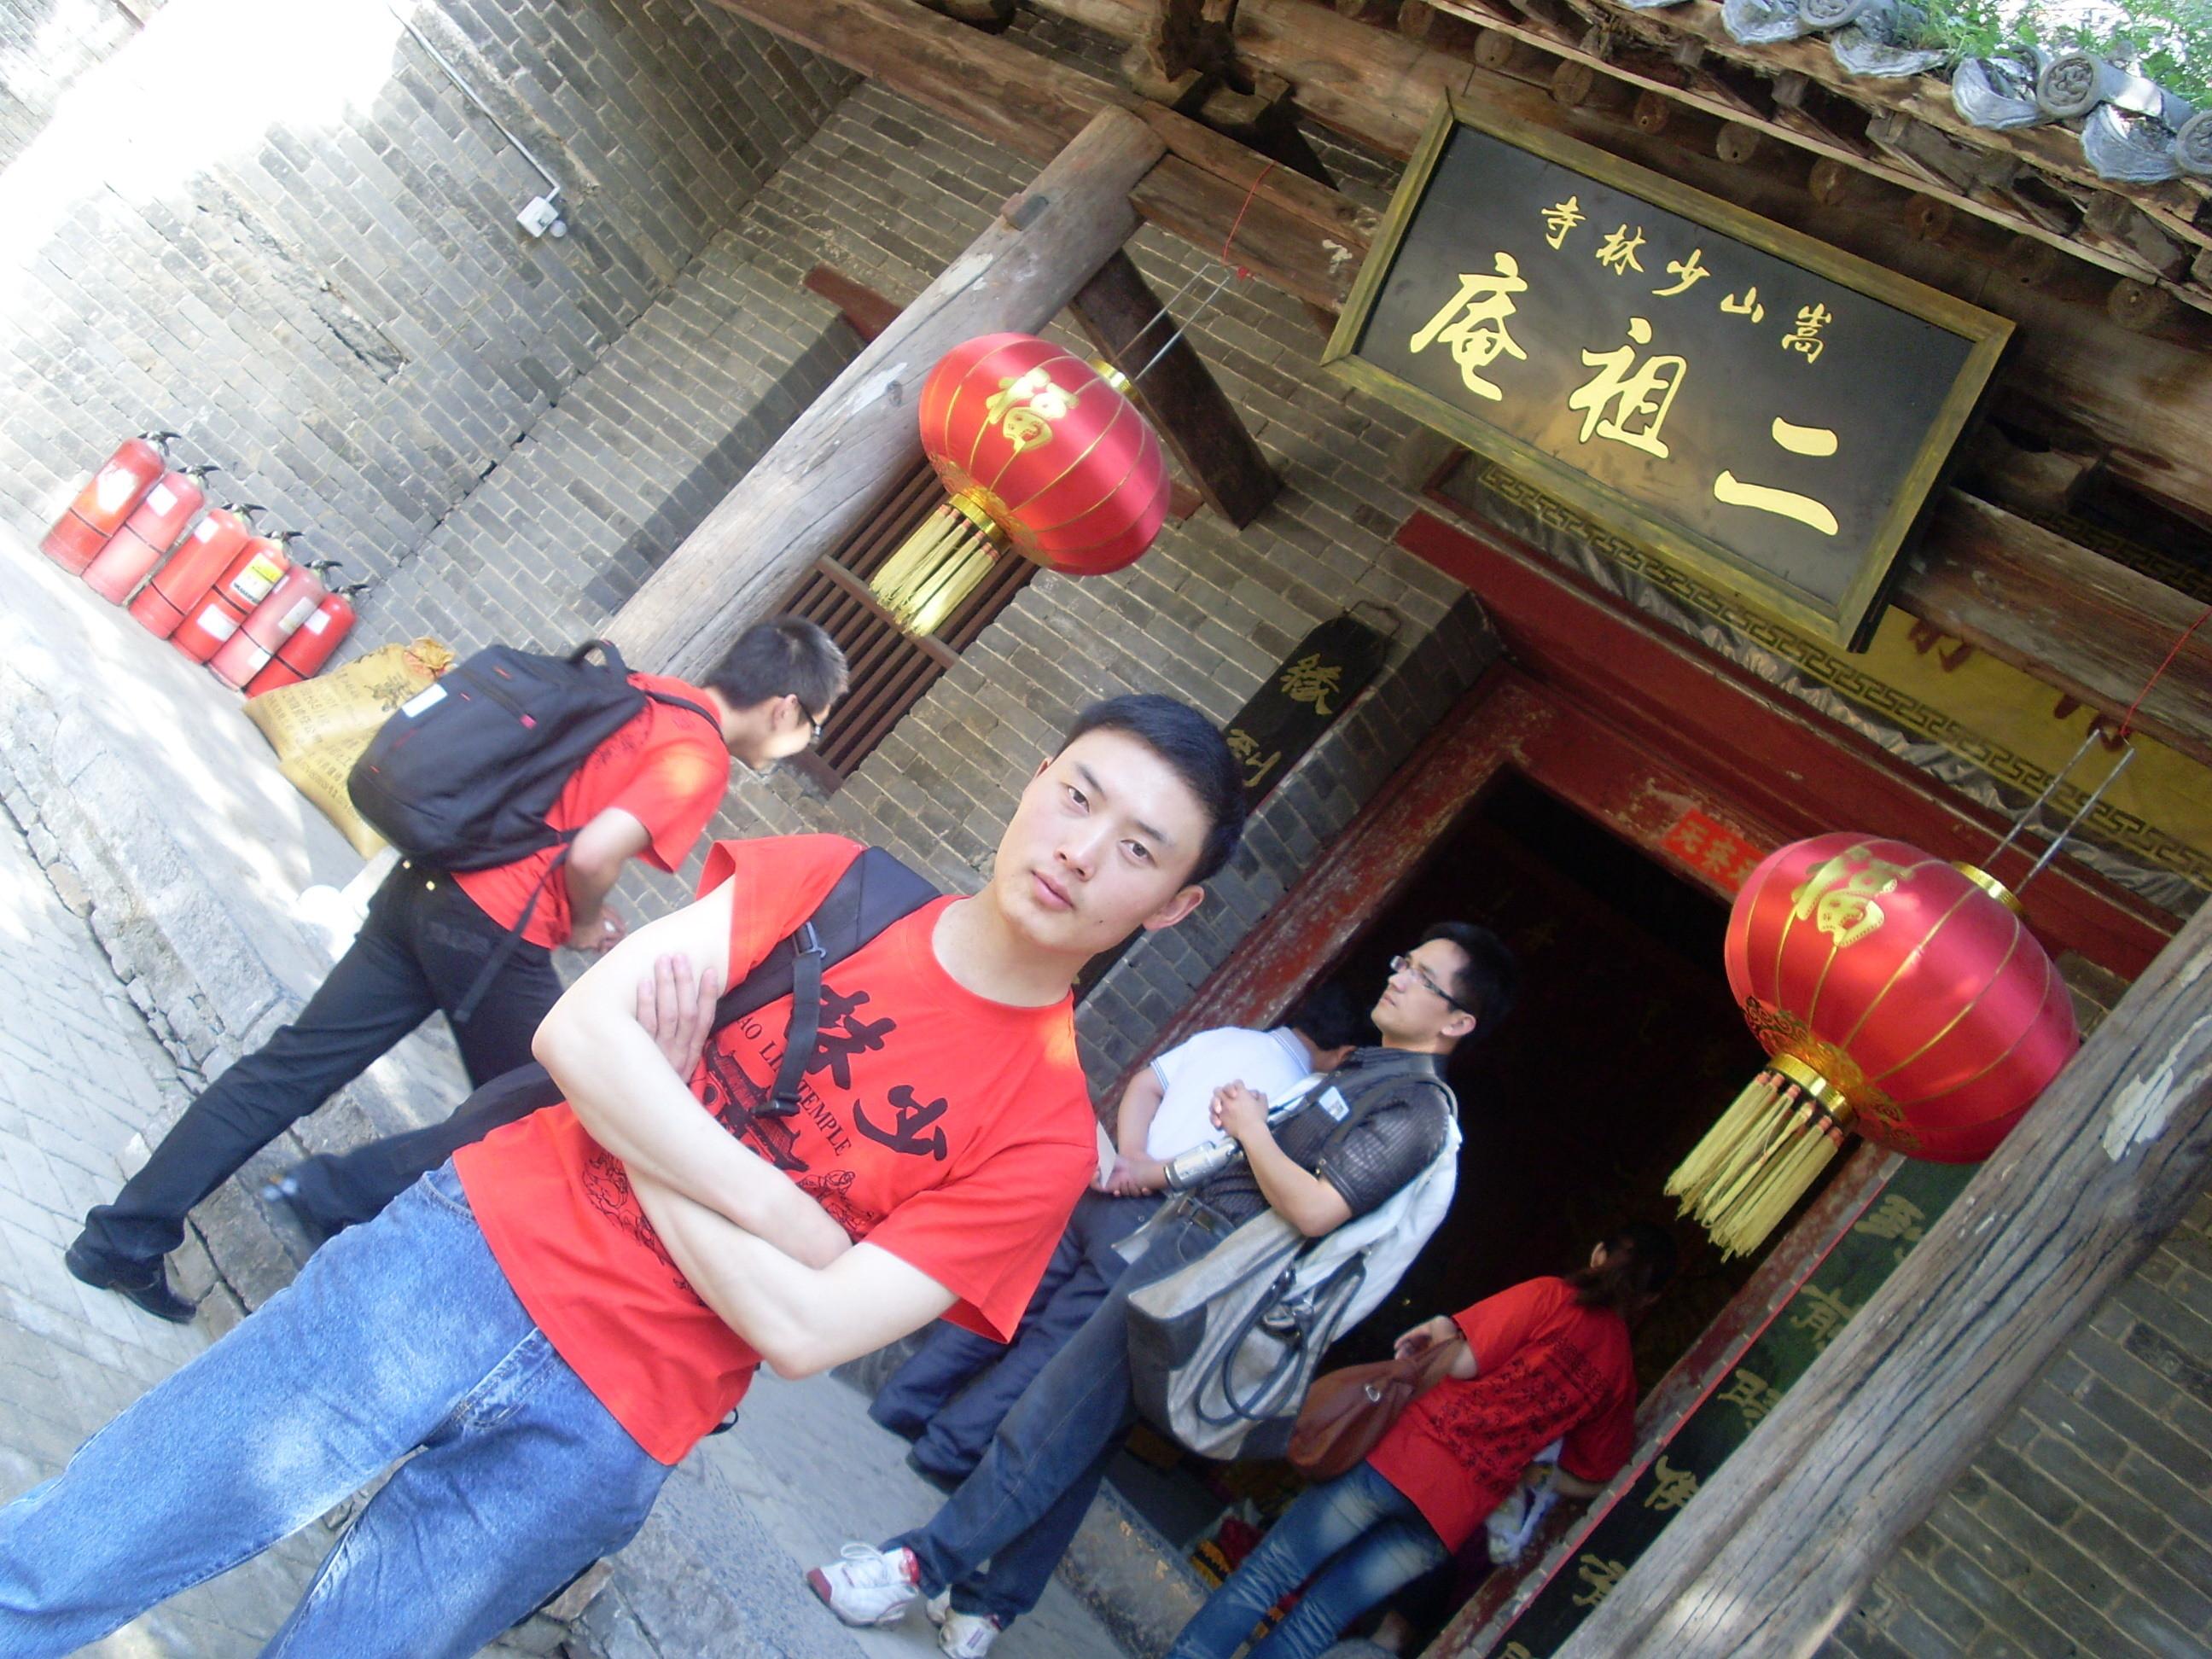 zhangzhang